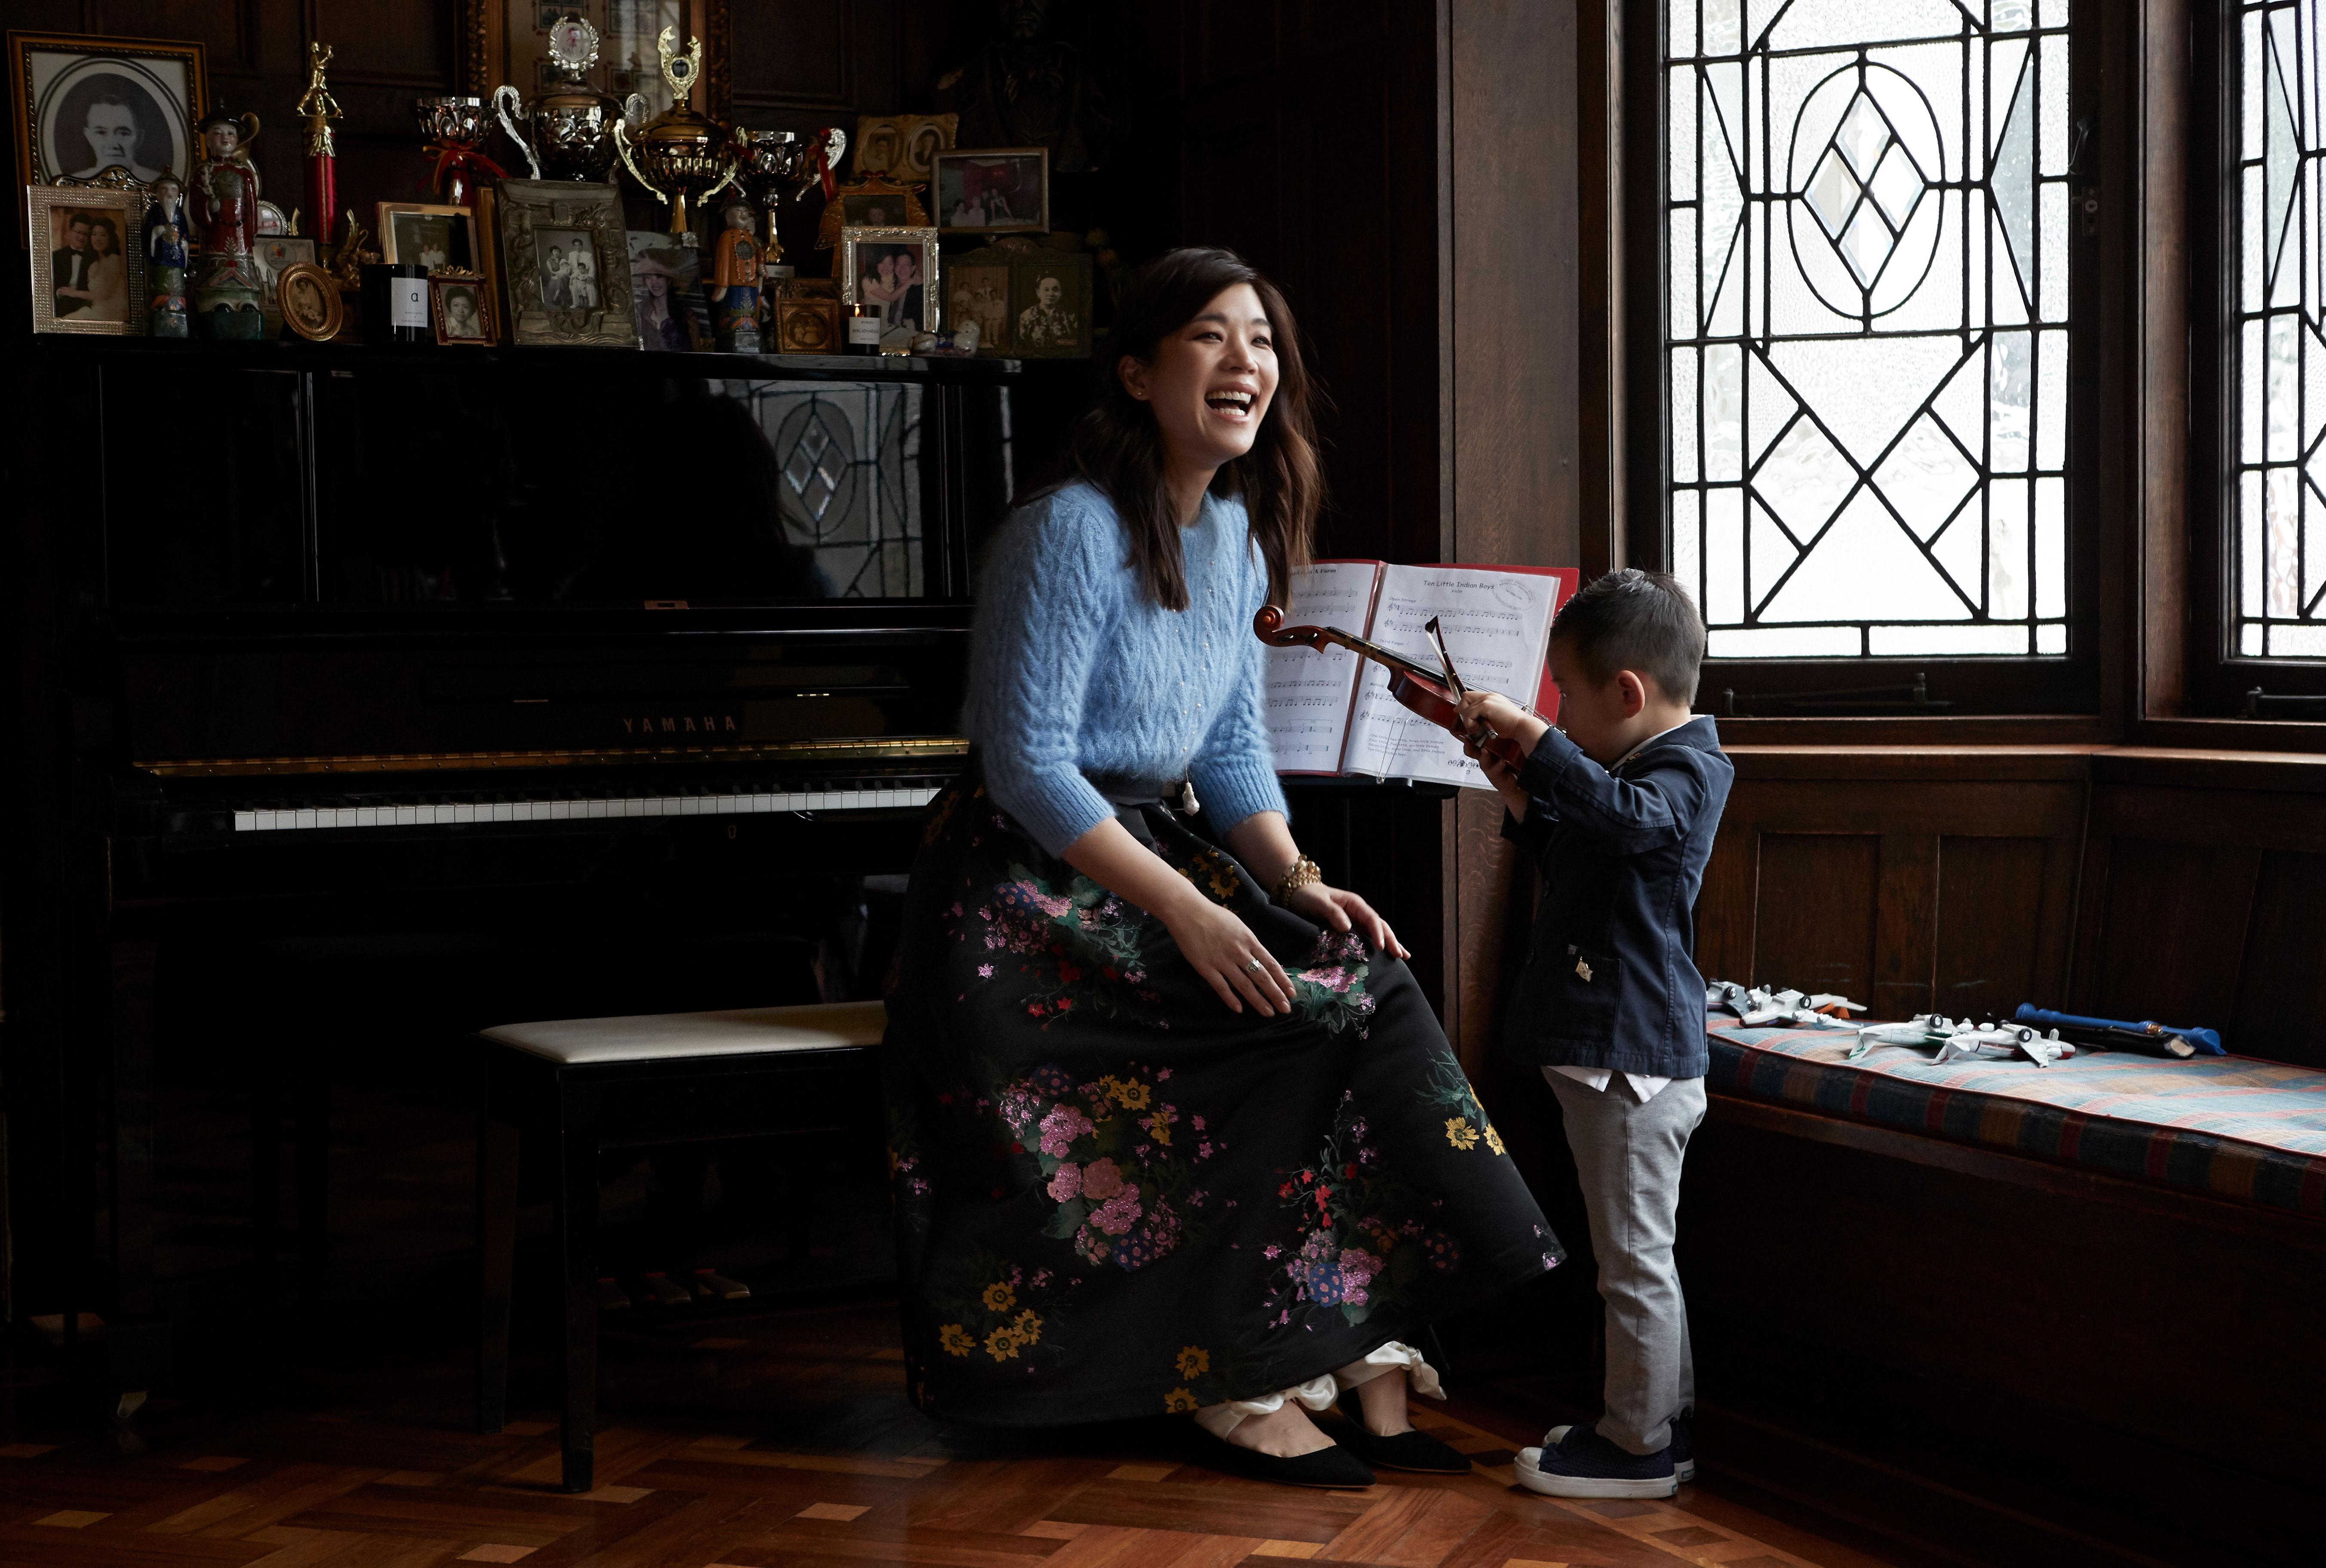 Shen-Tel Lee Shares Her Letter To Her Two Boys, Benjamin & Kingston